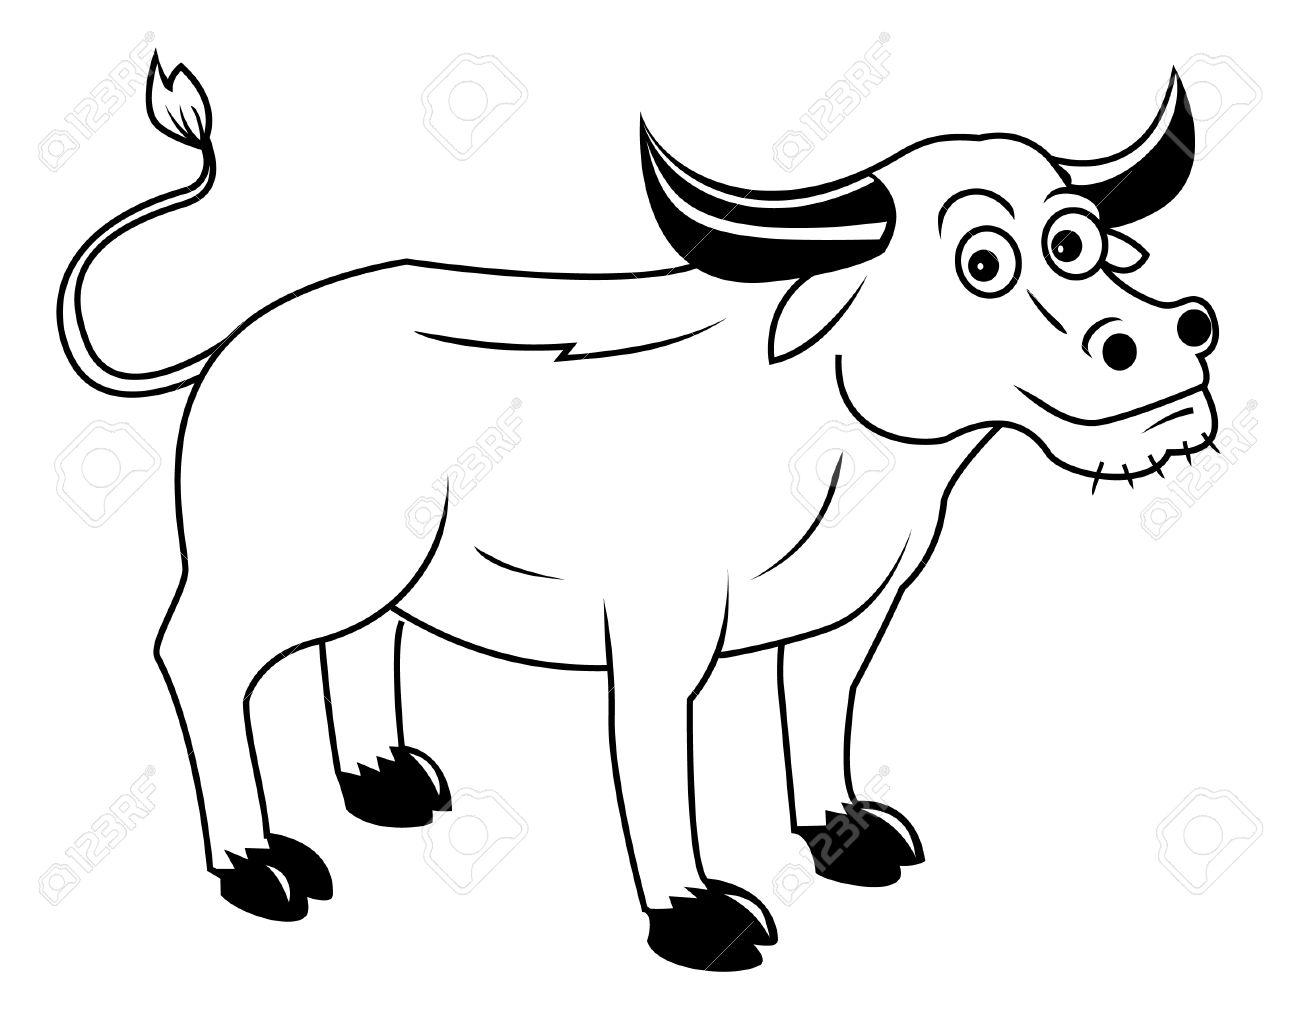 Buffalo Clipart Black And White Buffalo Black And White